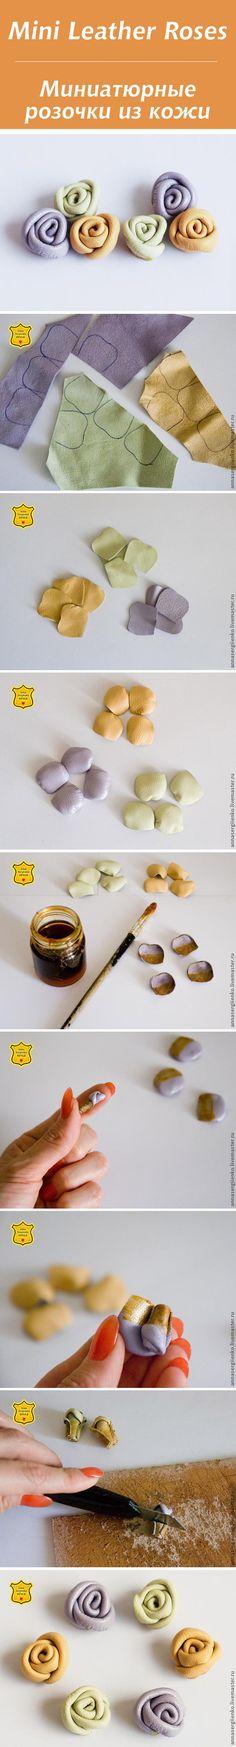 Миниатюрные розочки из кожи / Mini Leather Roses #leather #tutorial